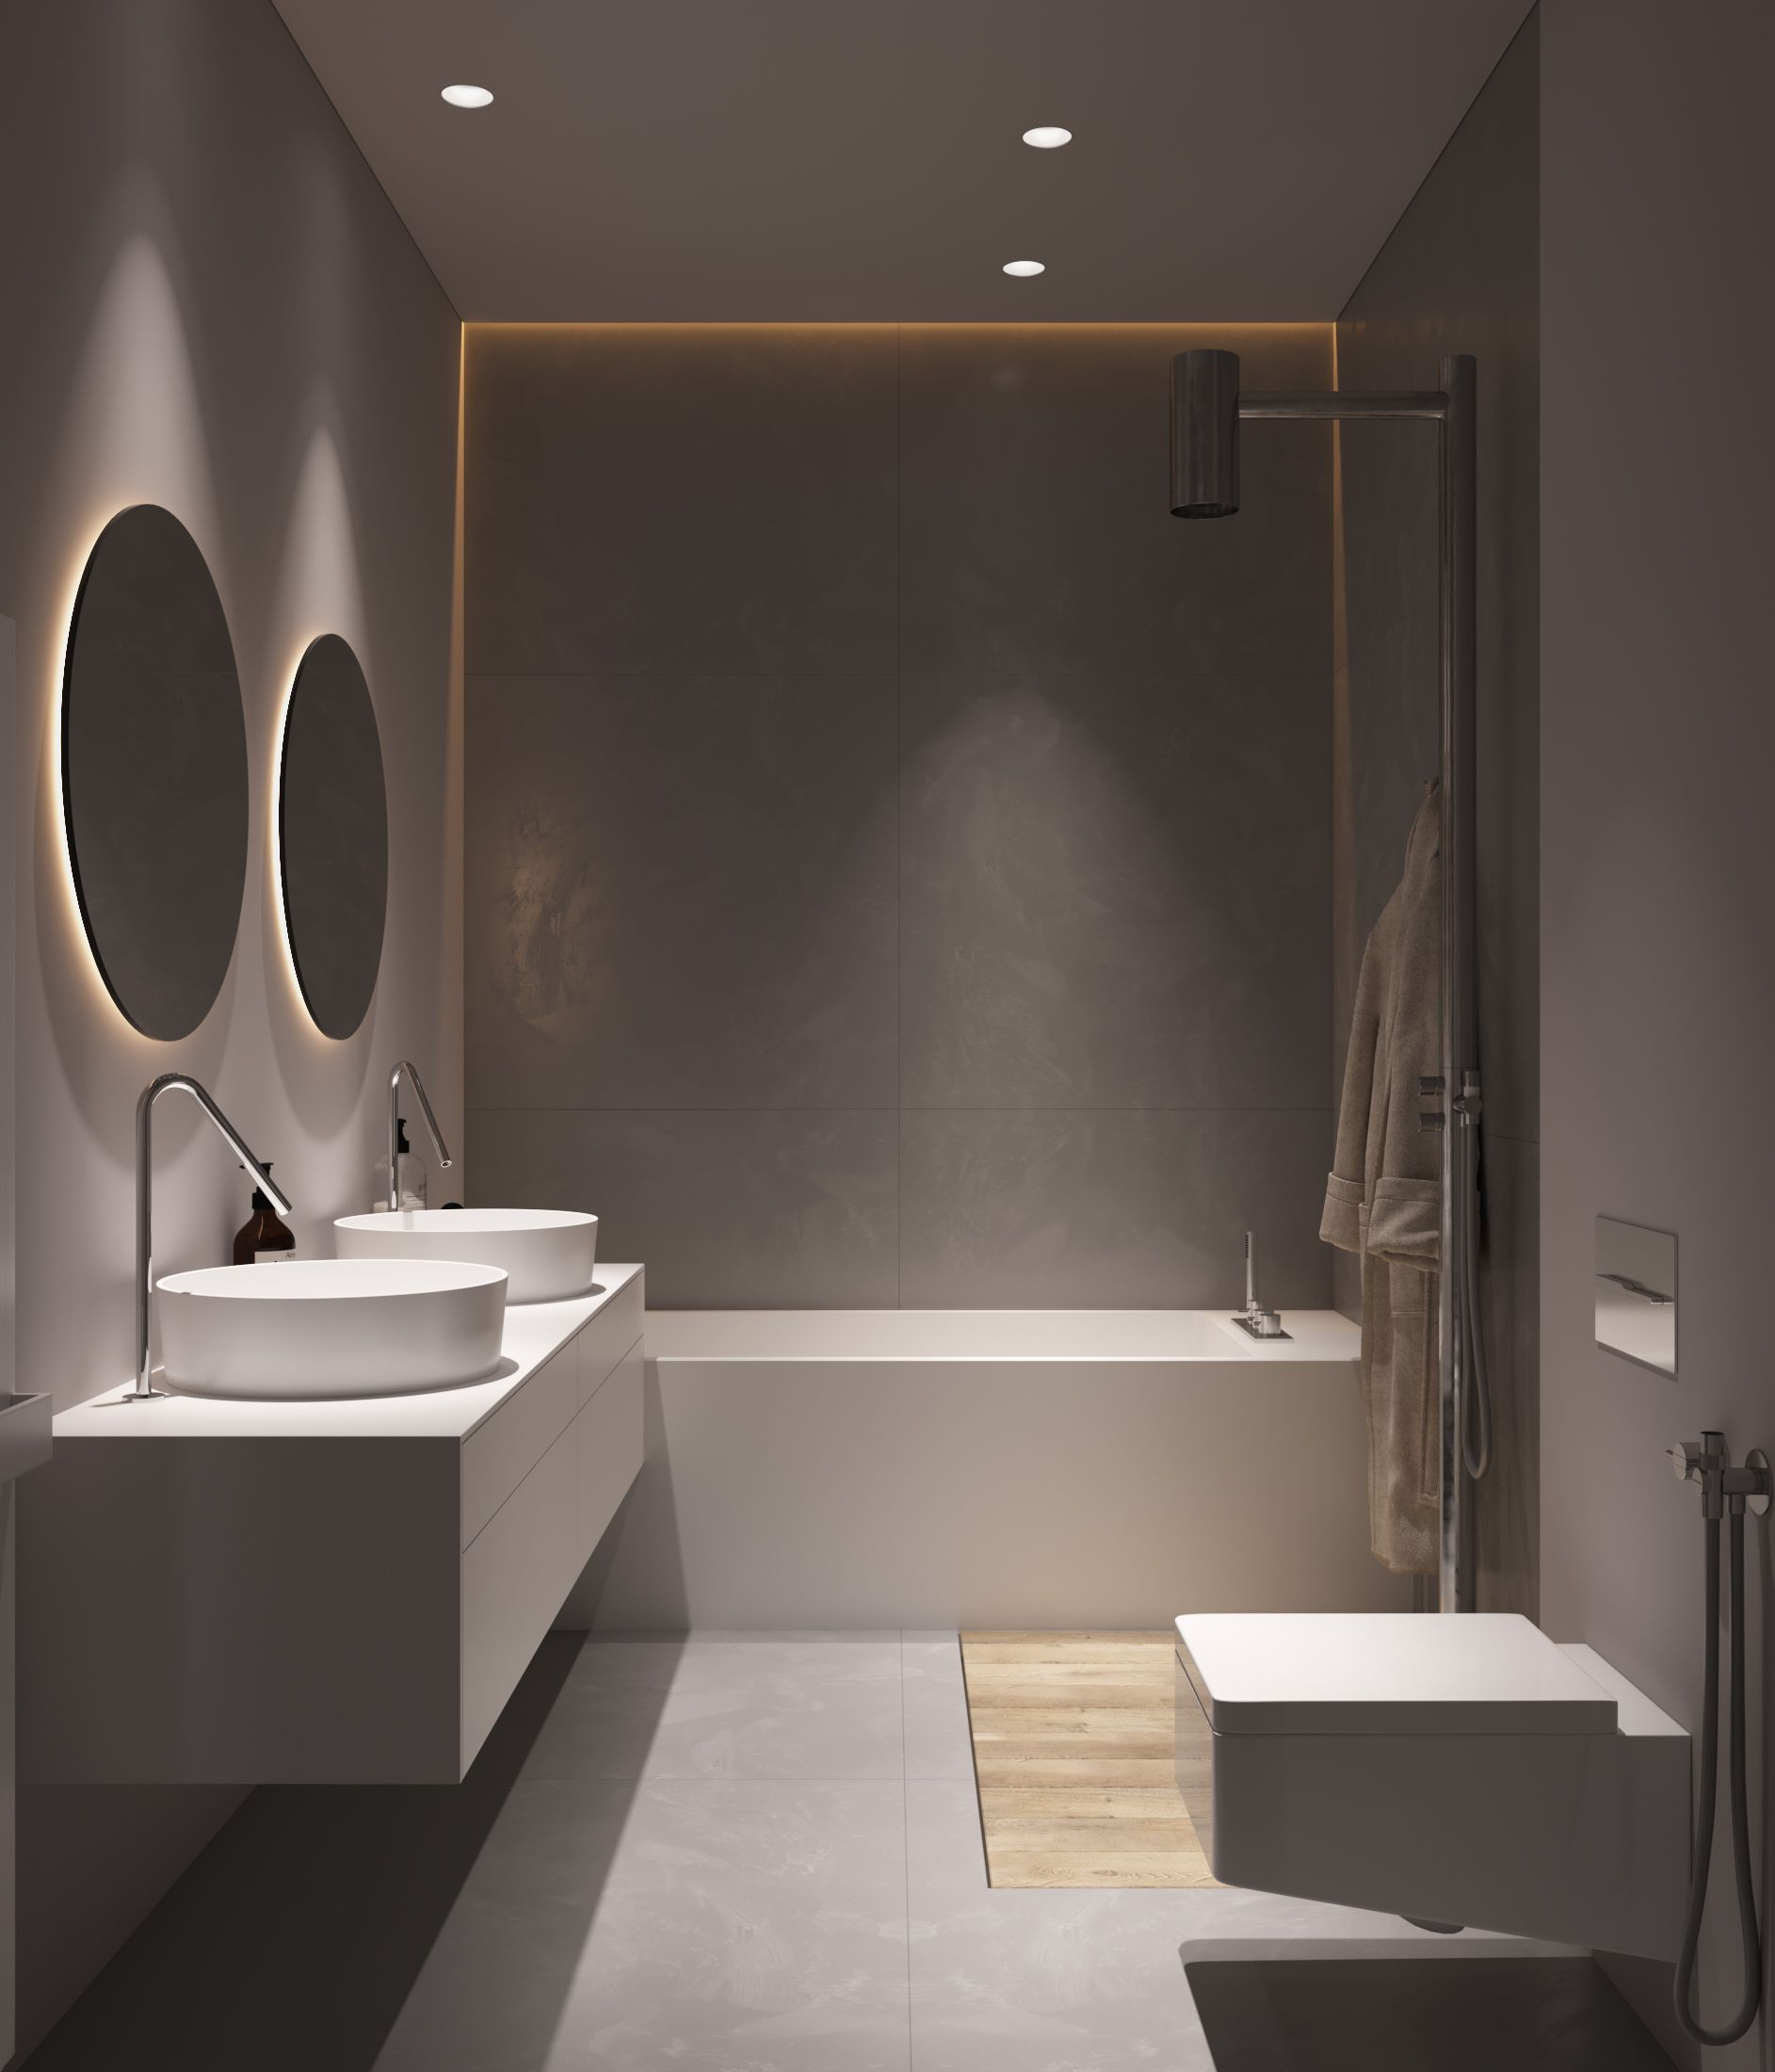 Bfpa4 Z Design Com Ua Bathroom Pinterest Bath # Muebles Gil Alburquerque